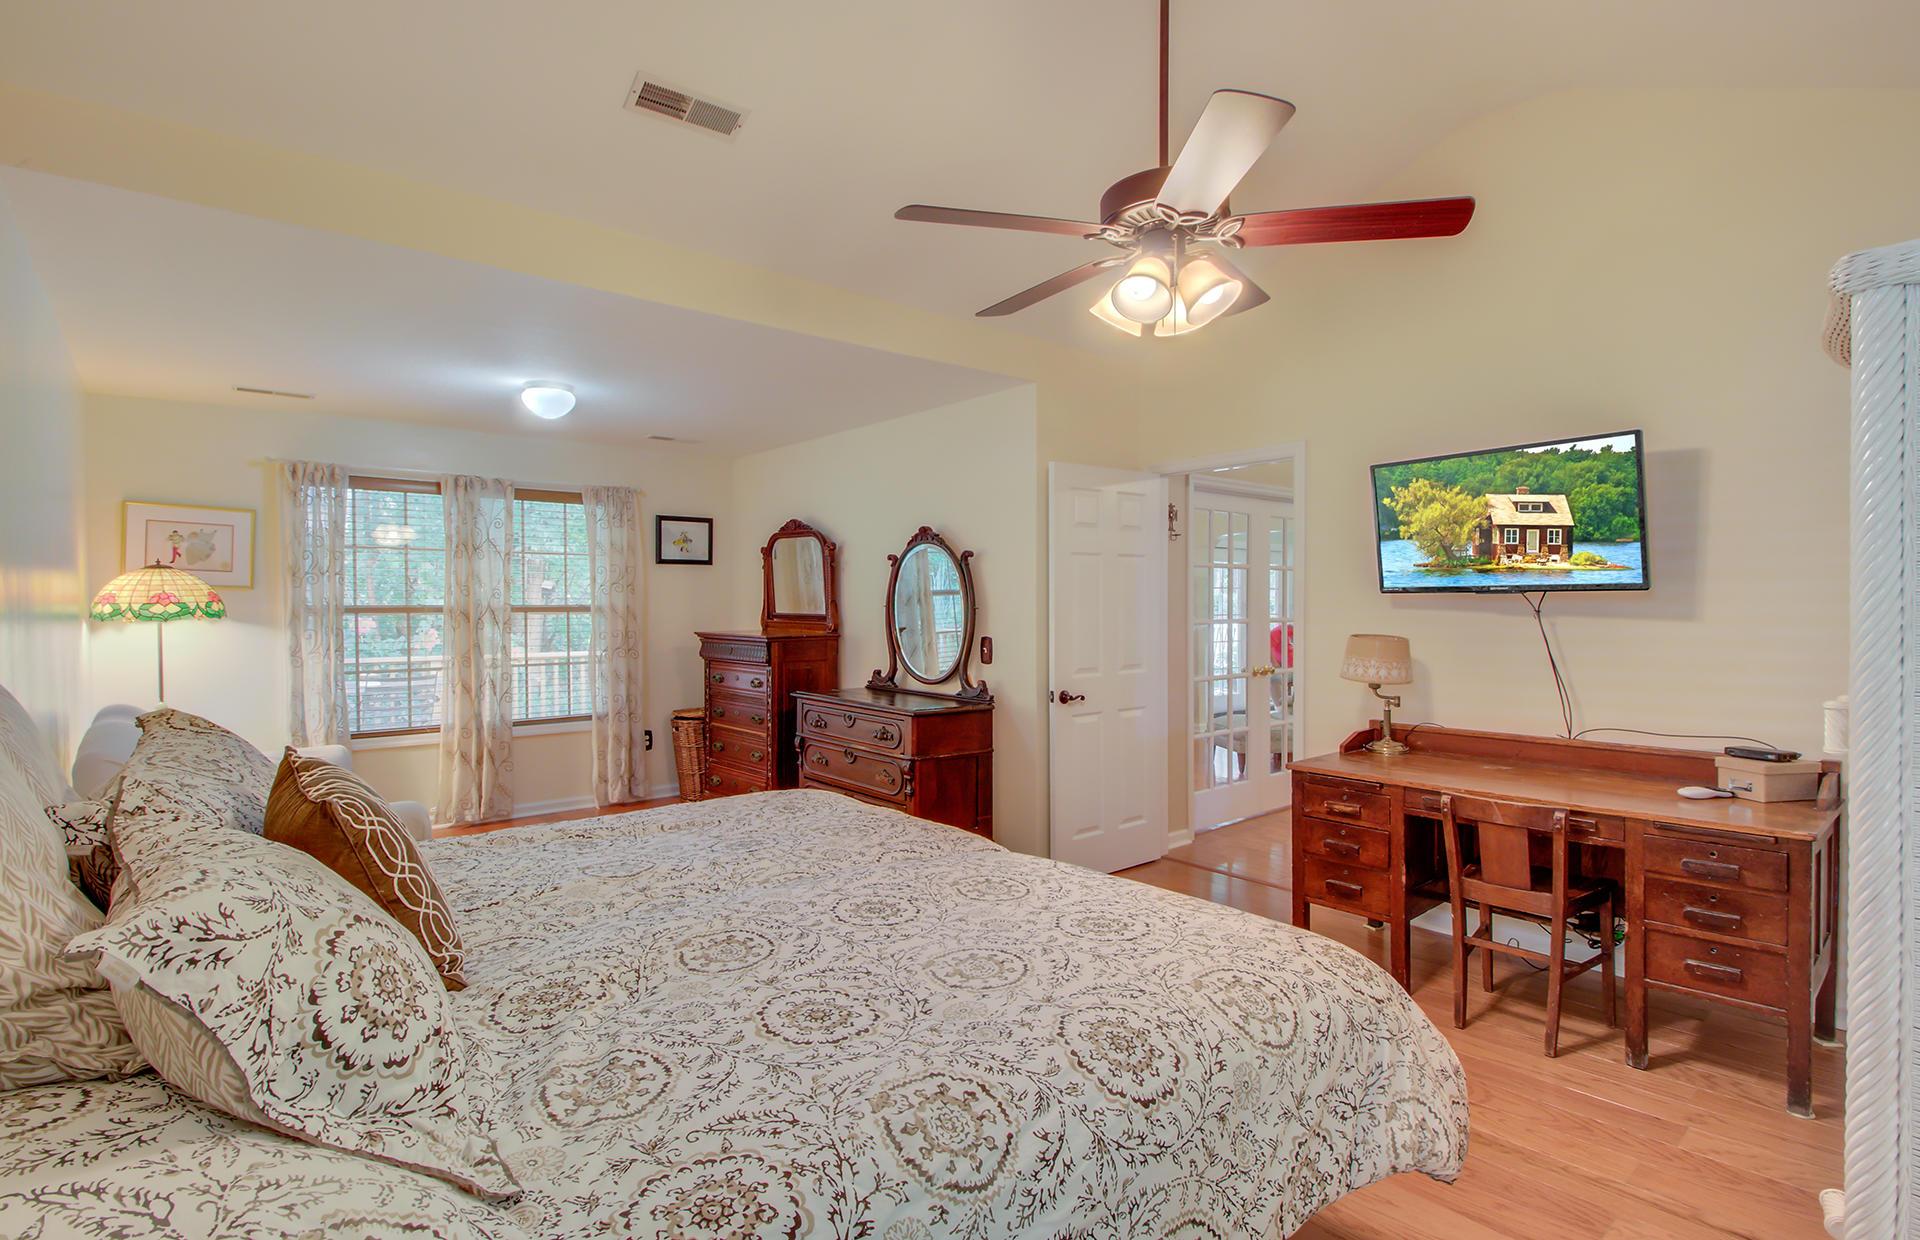 Park West Homes For Sale - 1500 Wellesley, Mount Pleasant, SC - 6